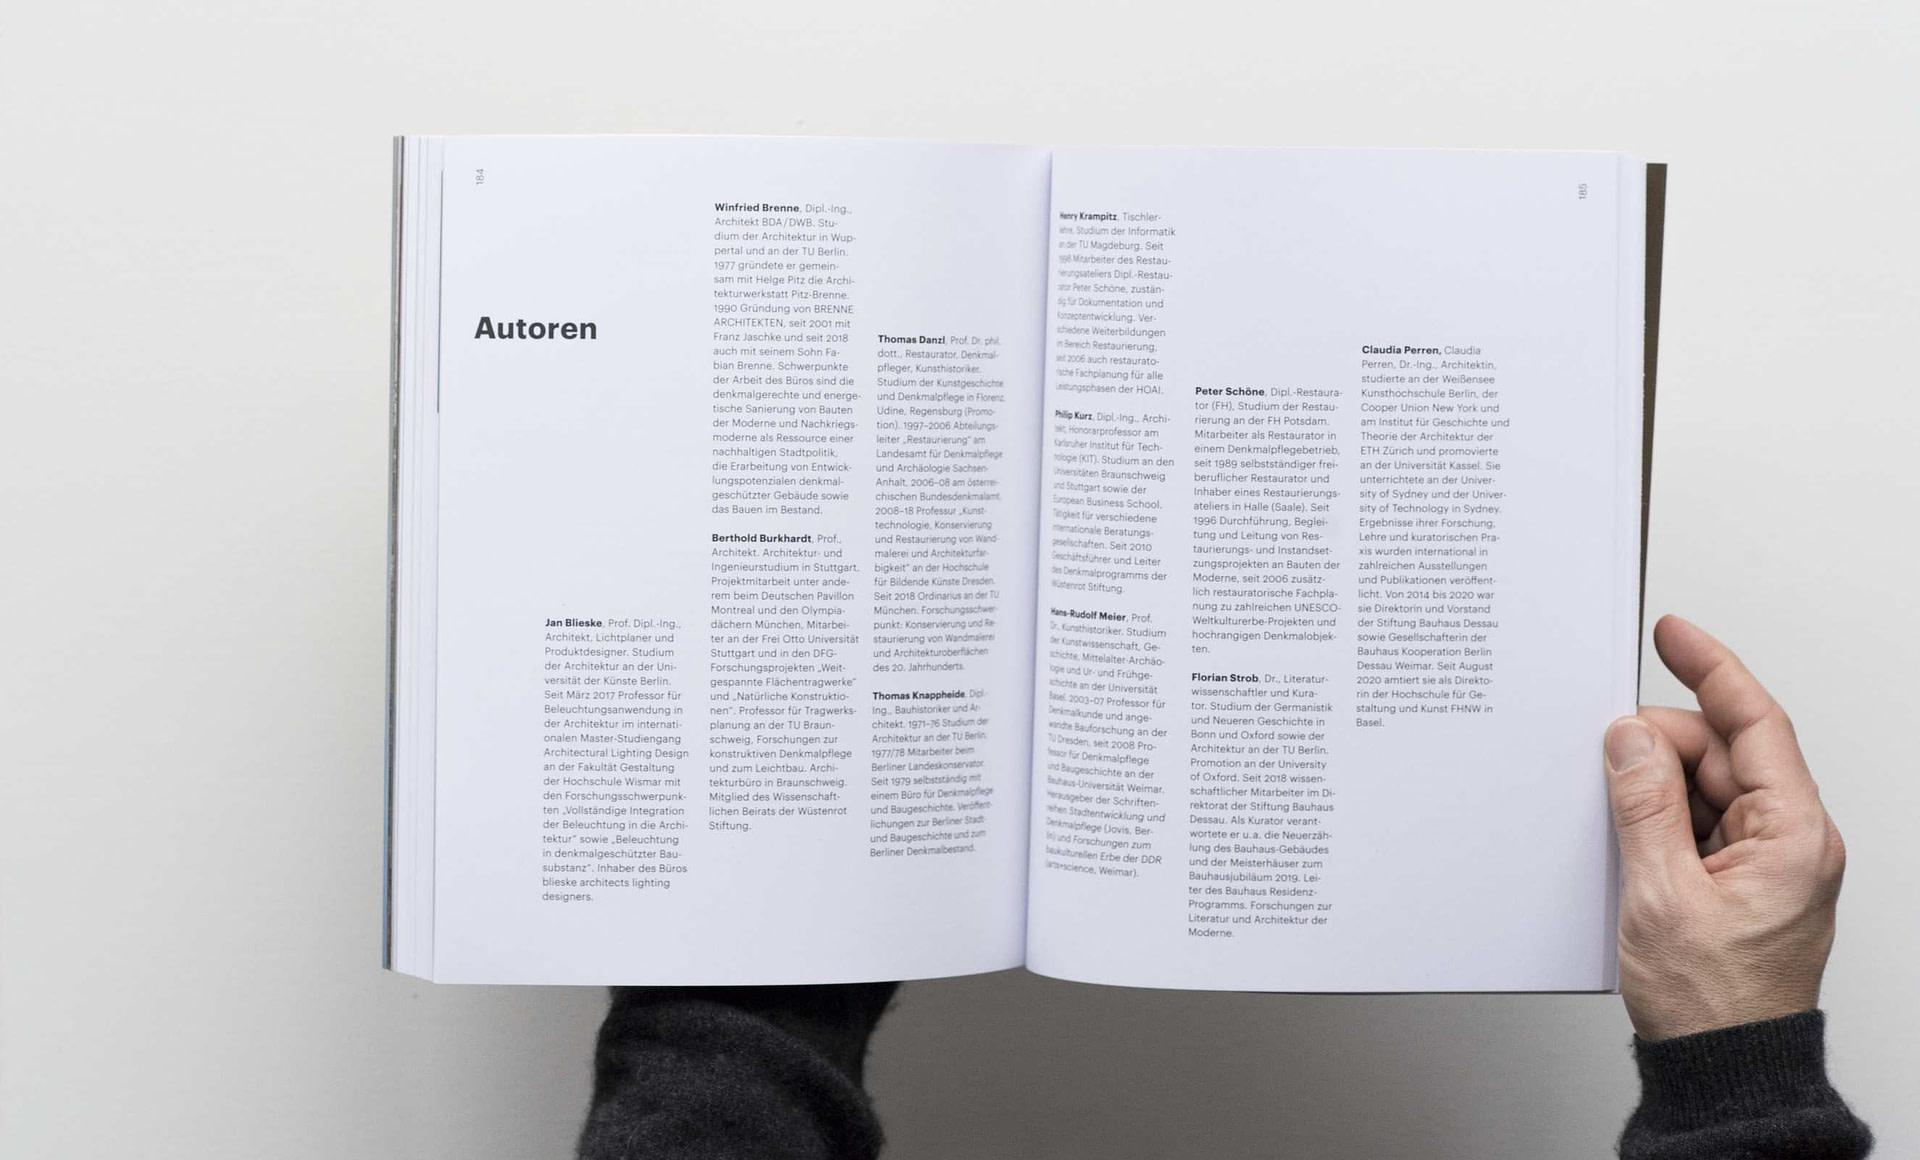 meisterhaus-kandinsky-klee-book-18-2650x1600px